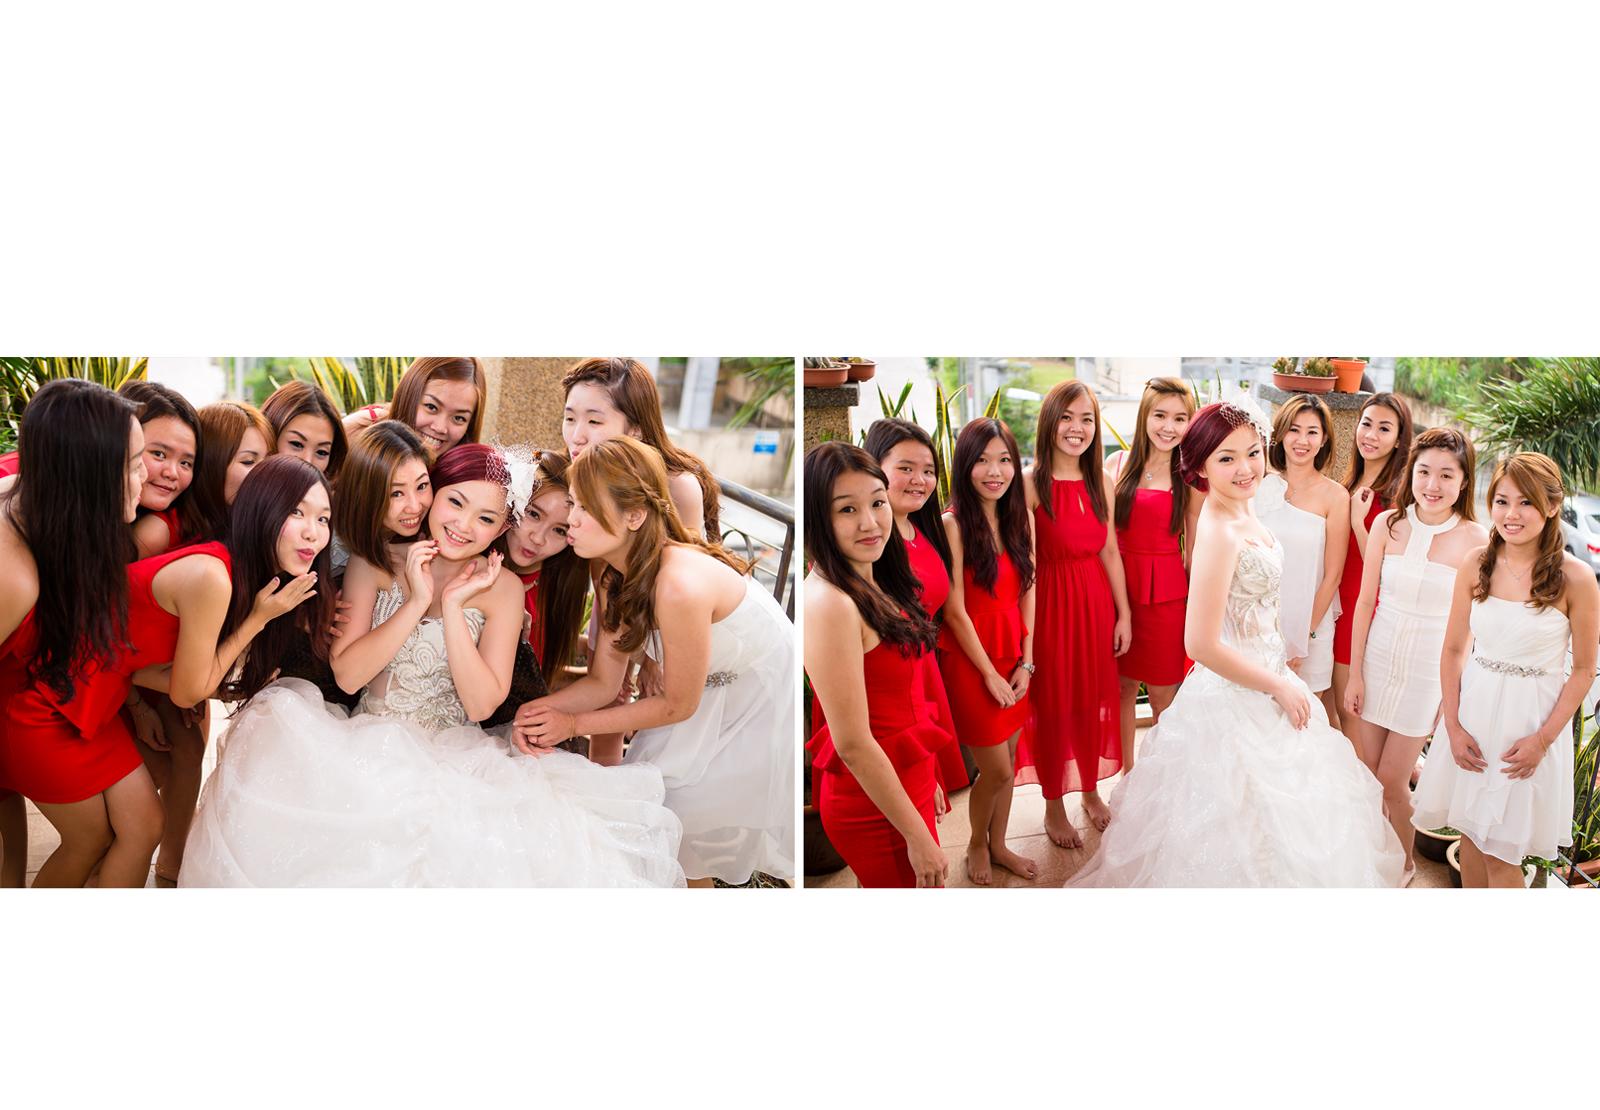 Wedding-Actual-Day---65_1